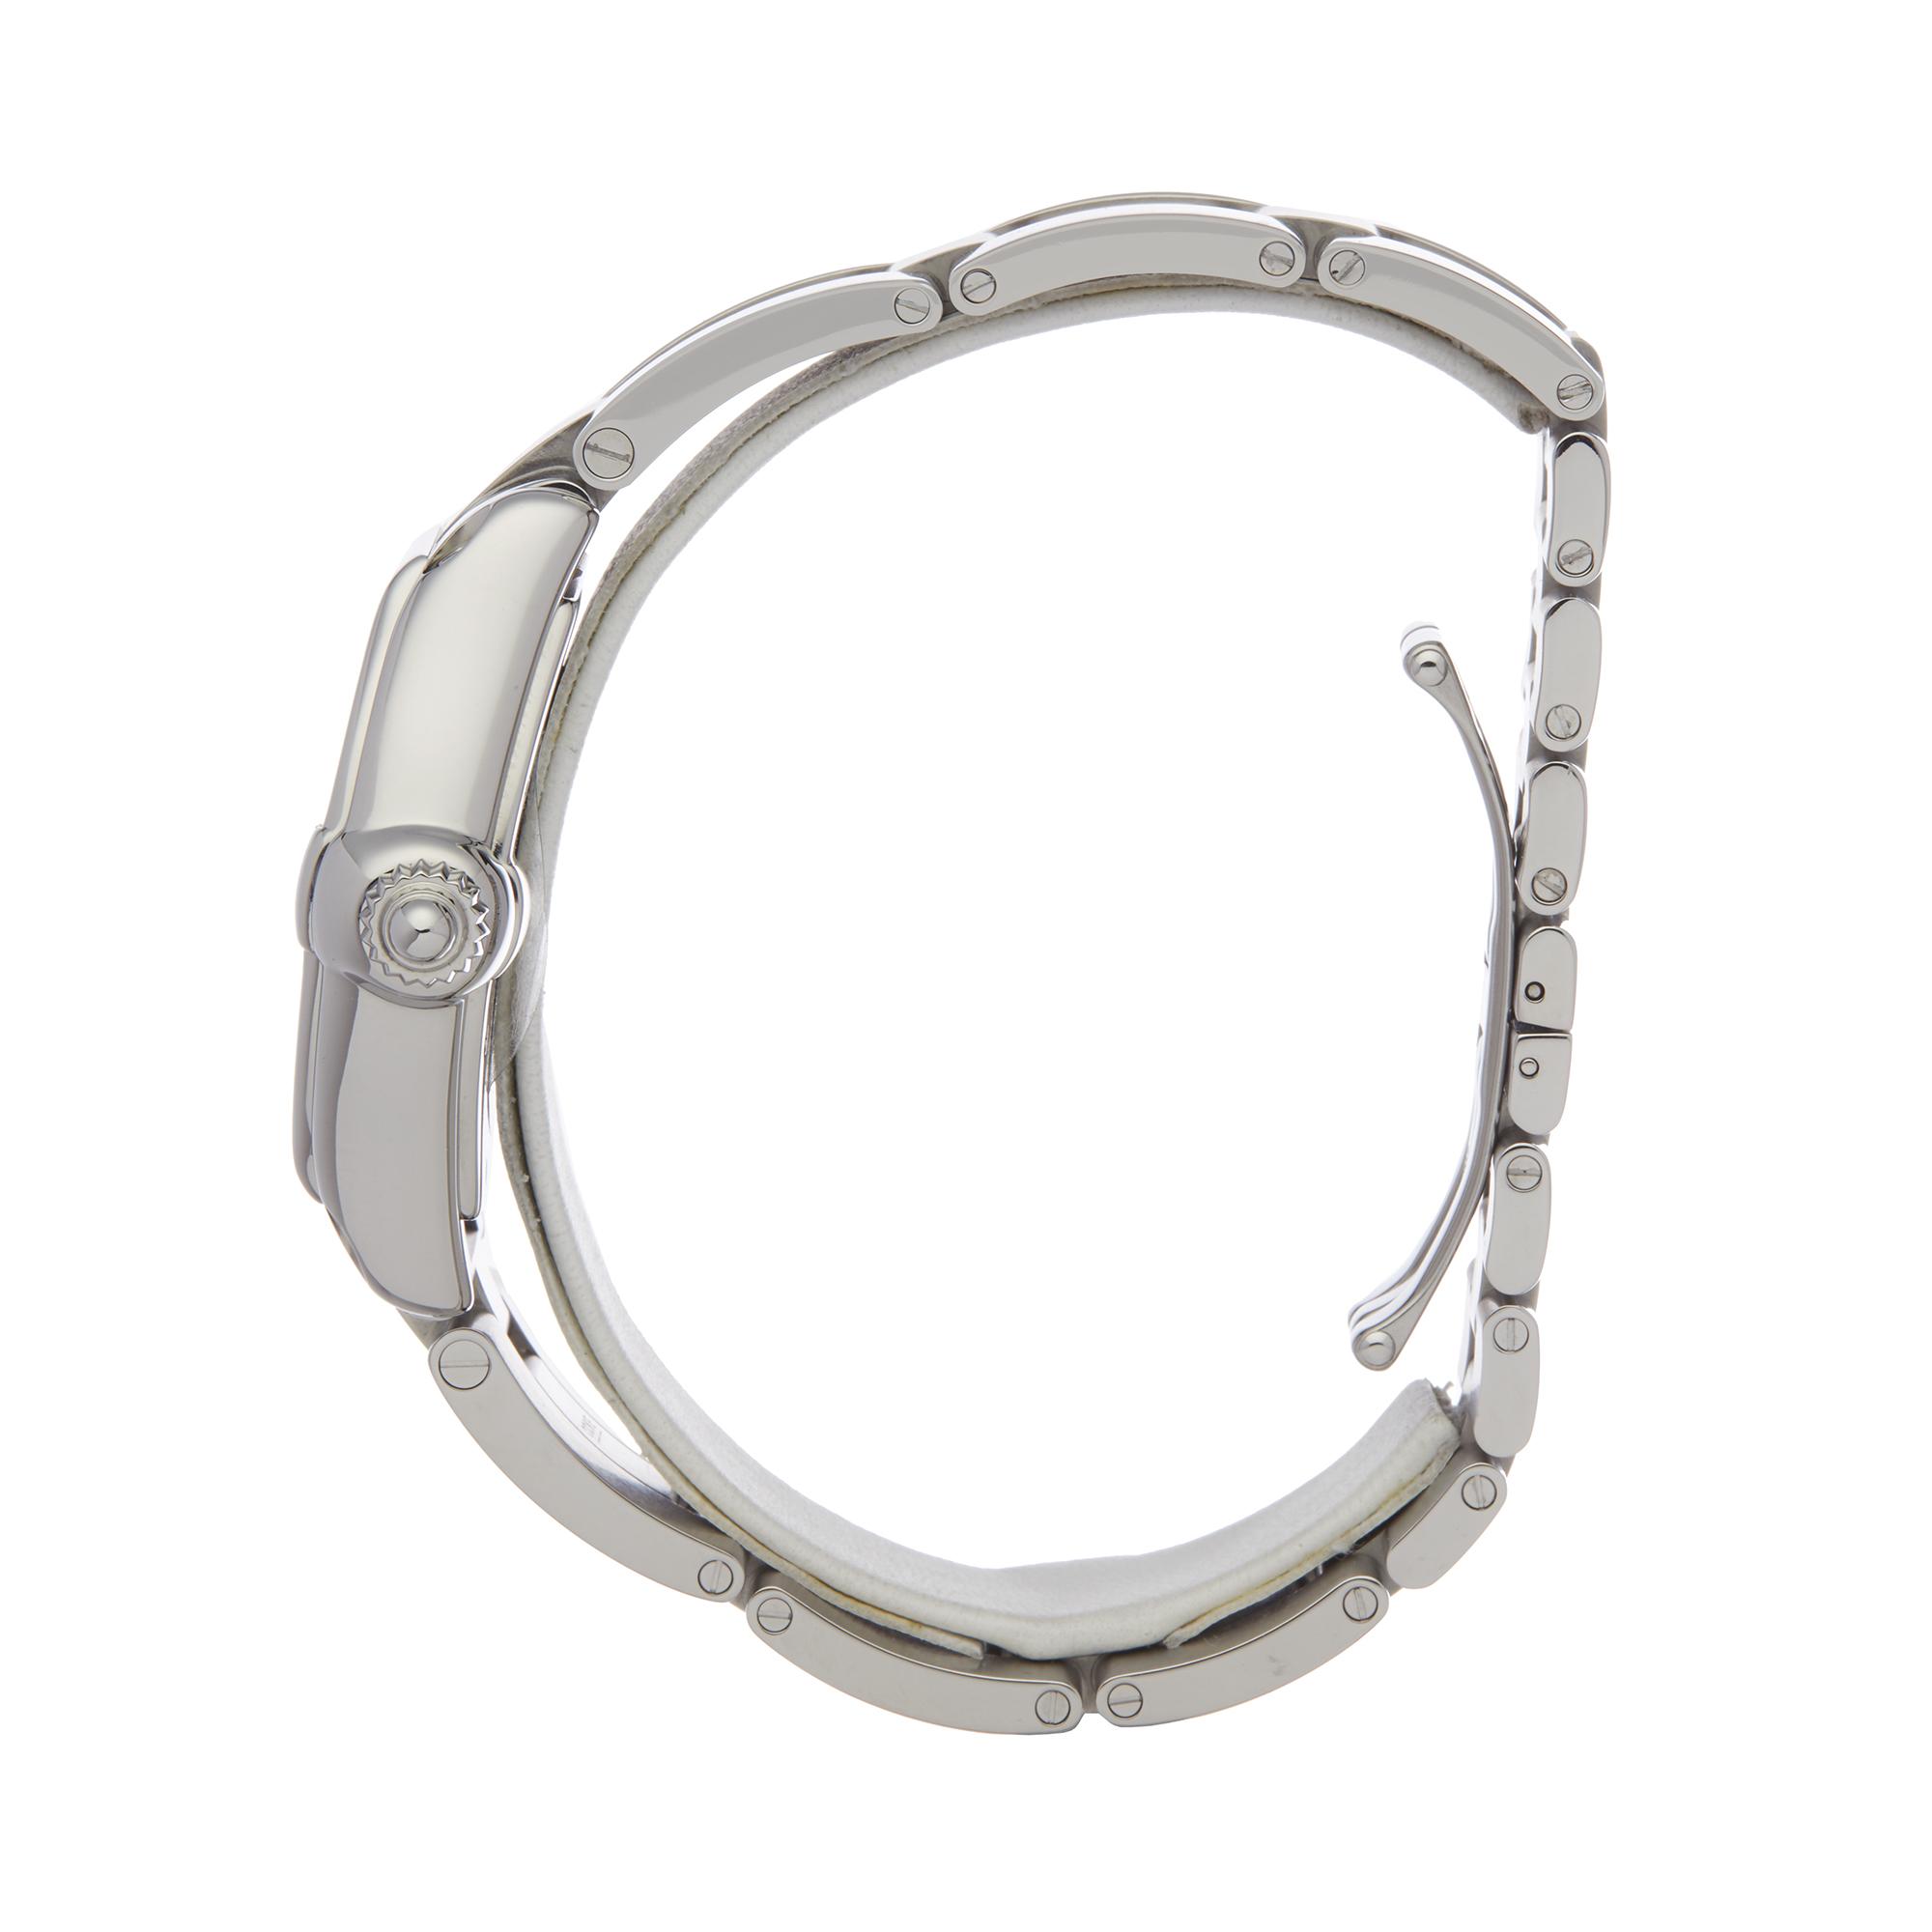 Cartier Roadster 2510 Men Stainless Steel Watch - Image 7 of 8